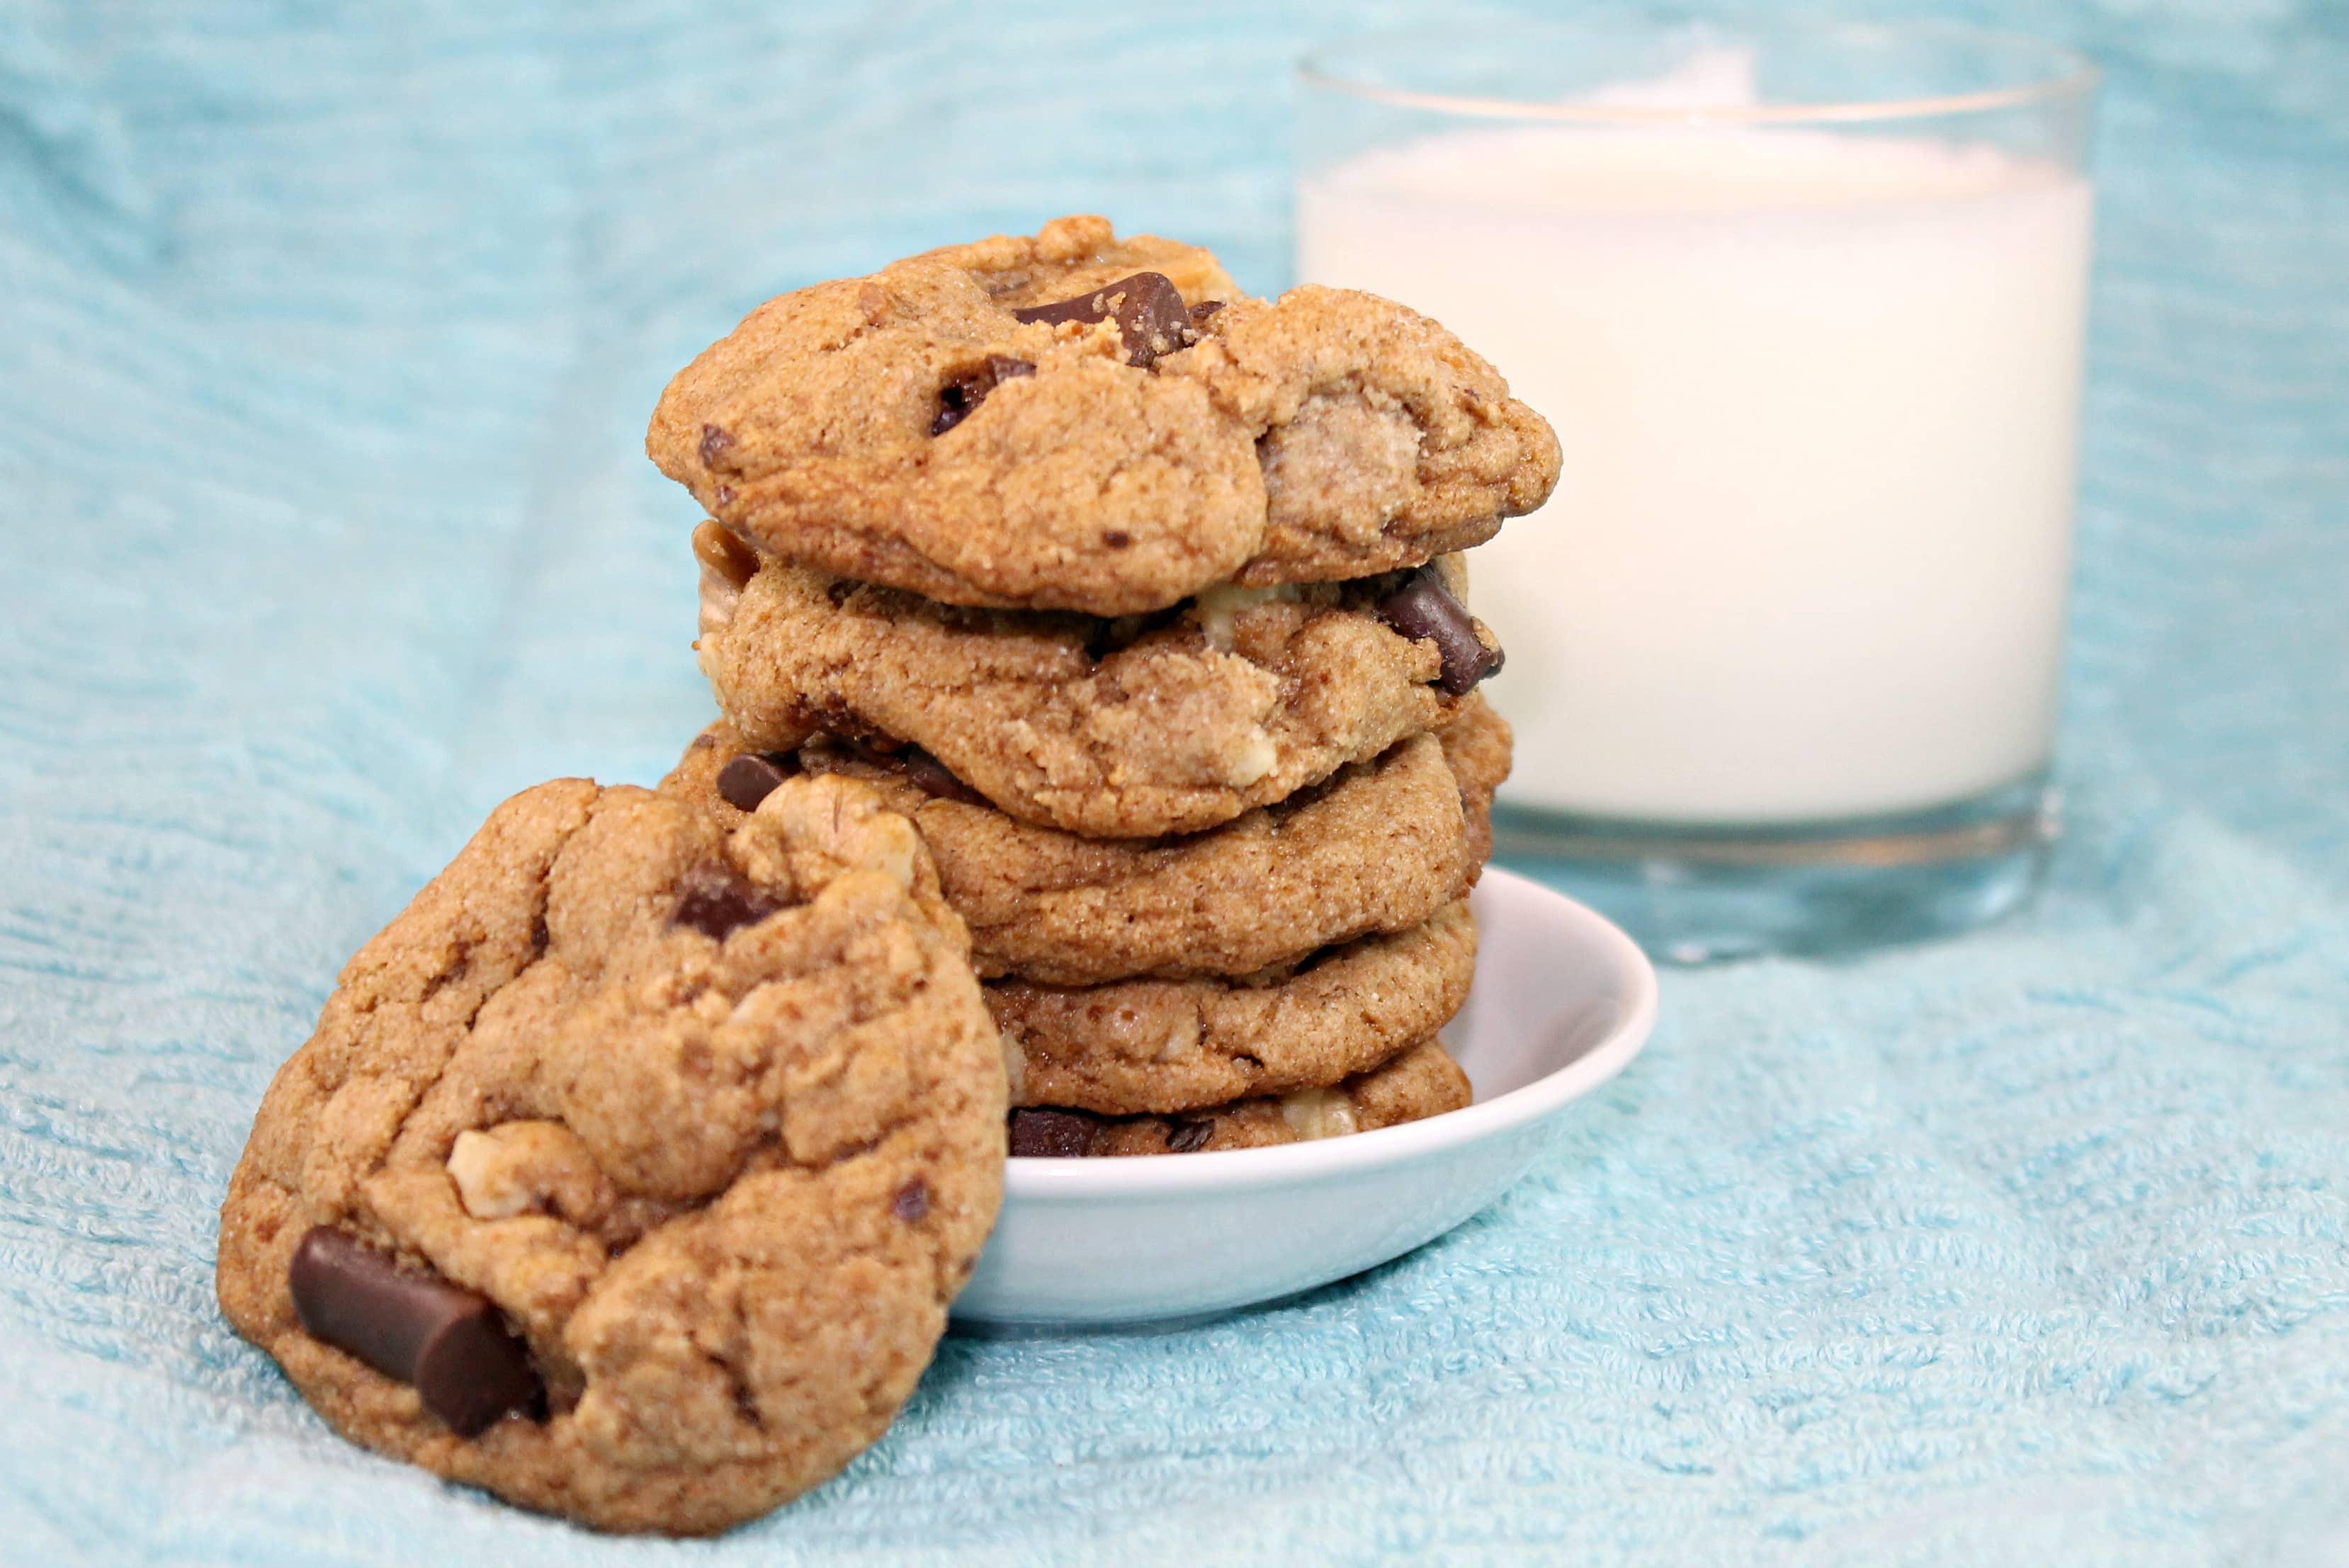 Chocolate Walnut Cookies - Vegan, Pink, & Purple! - The ...